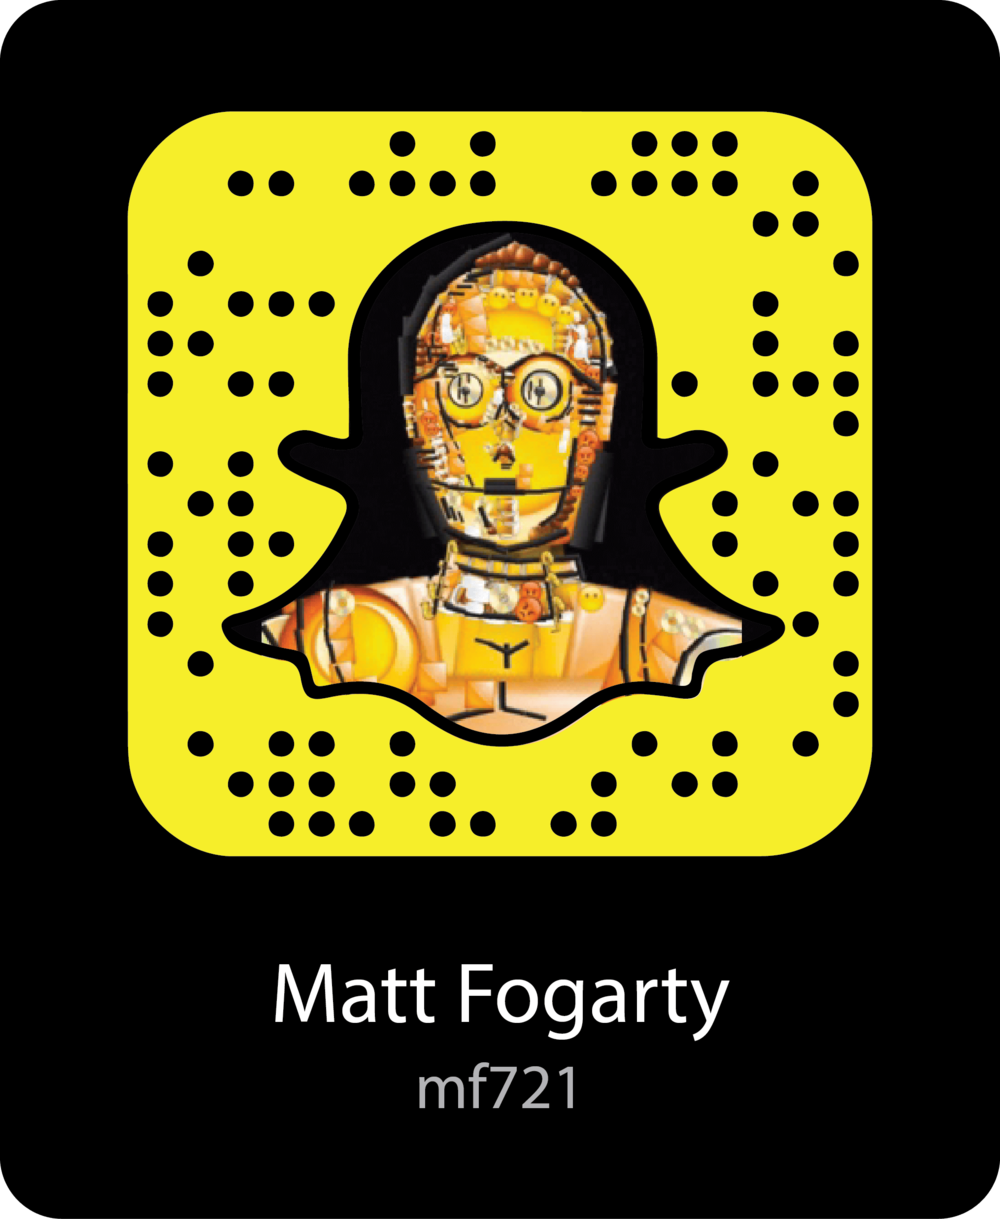 matt-fogarty-artists-snapchat-snapcode